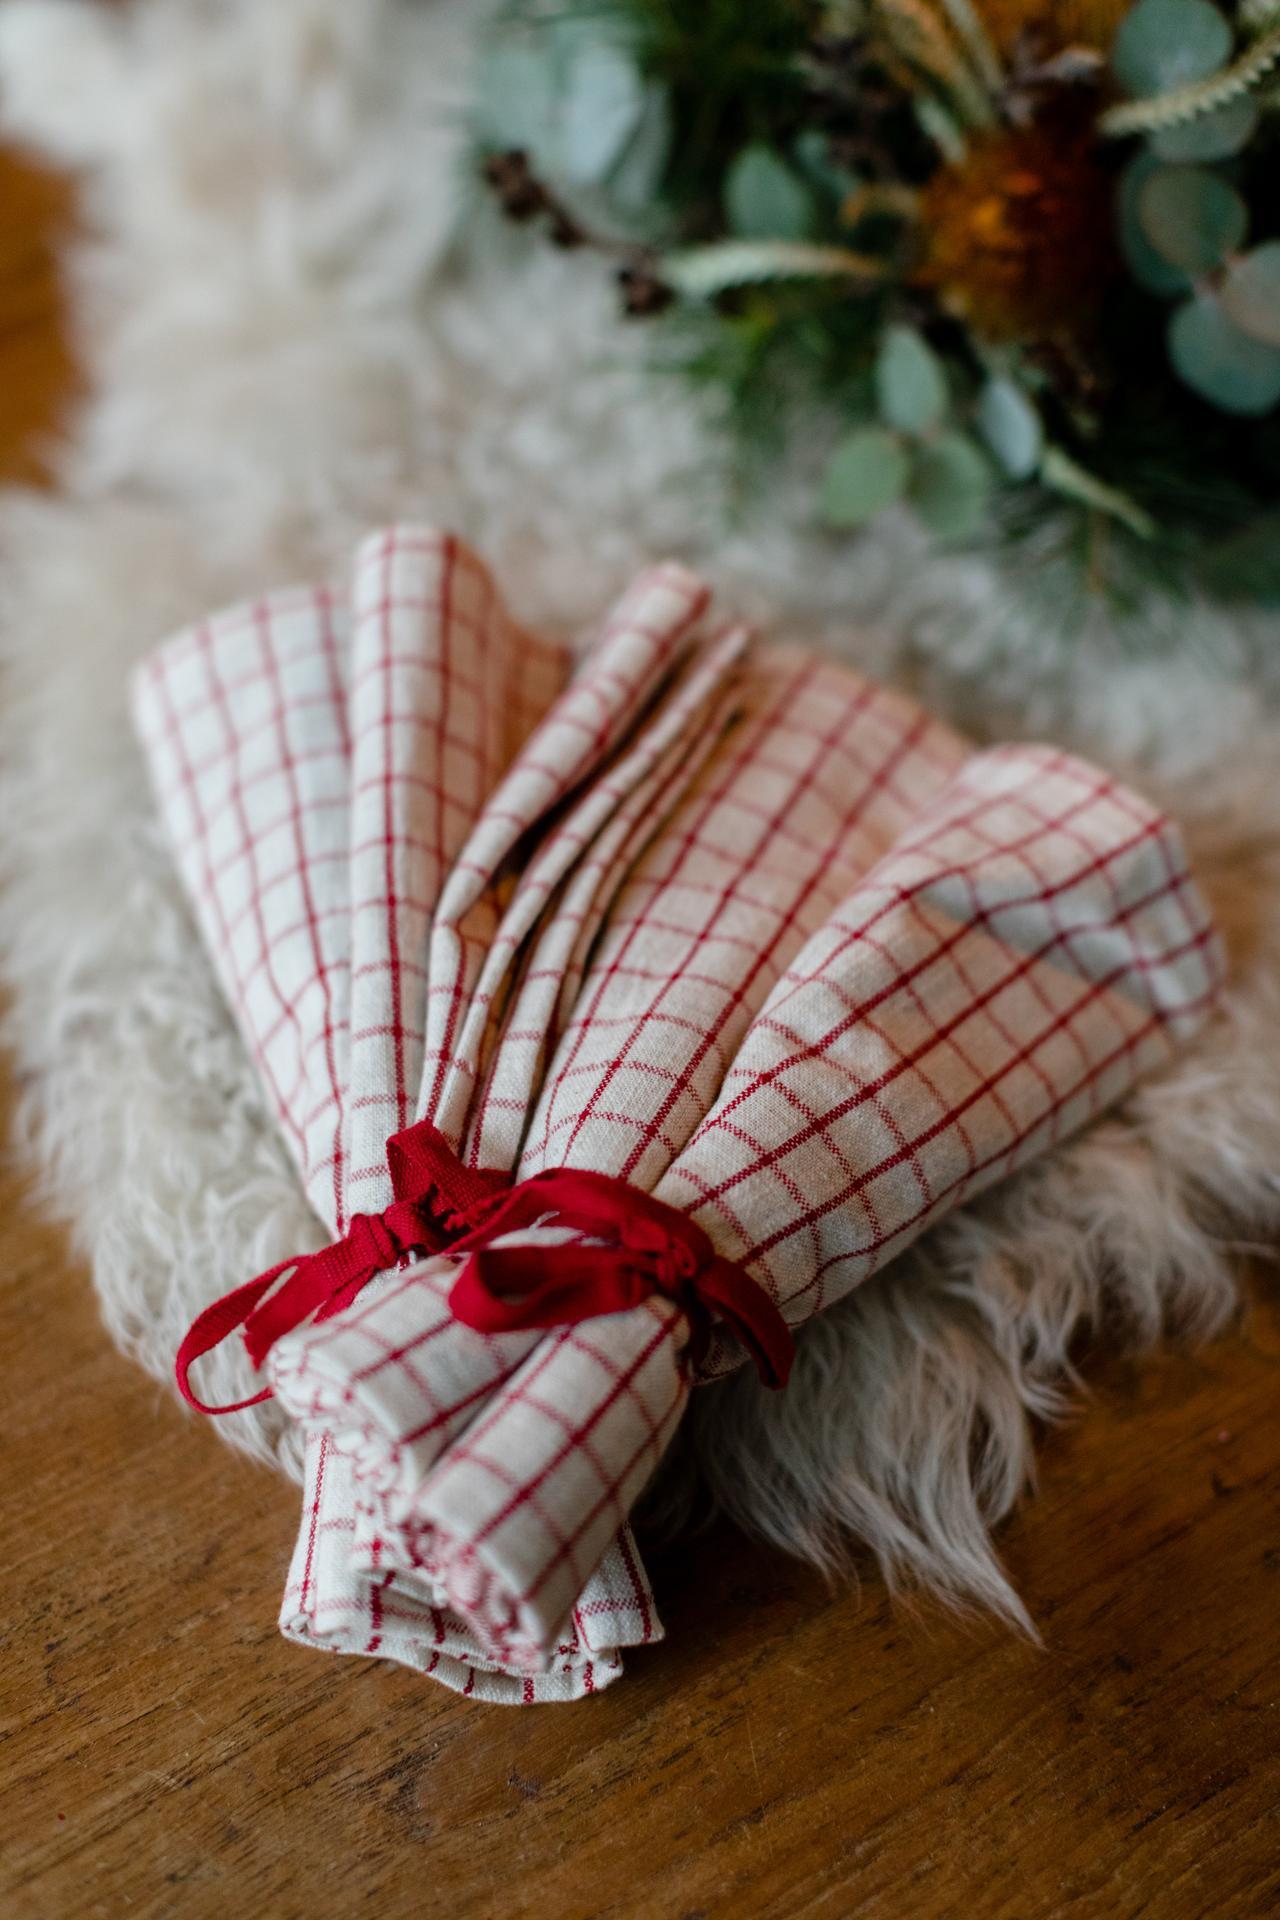 Vianoce 2020 - Latkove servitky som dnes nasla v h&m home.. musela som kupit, raz sa mi hodia :-D